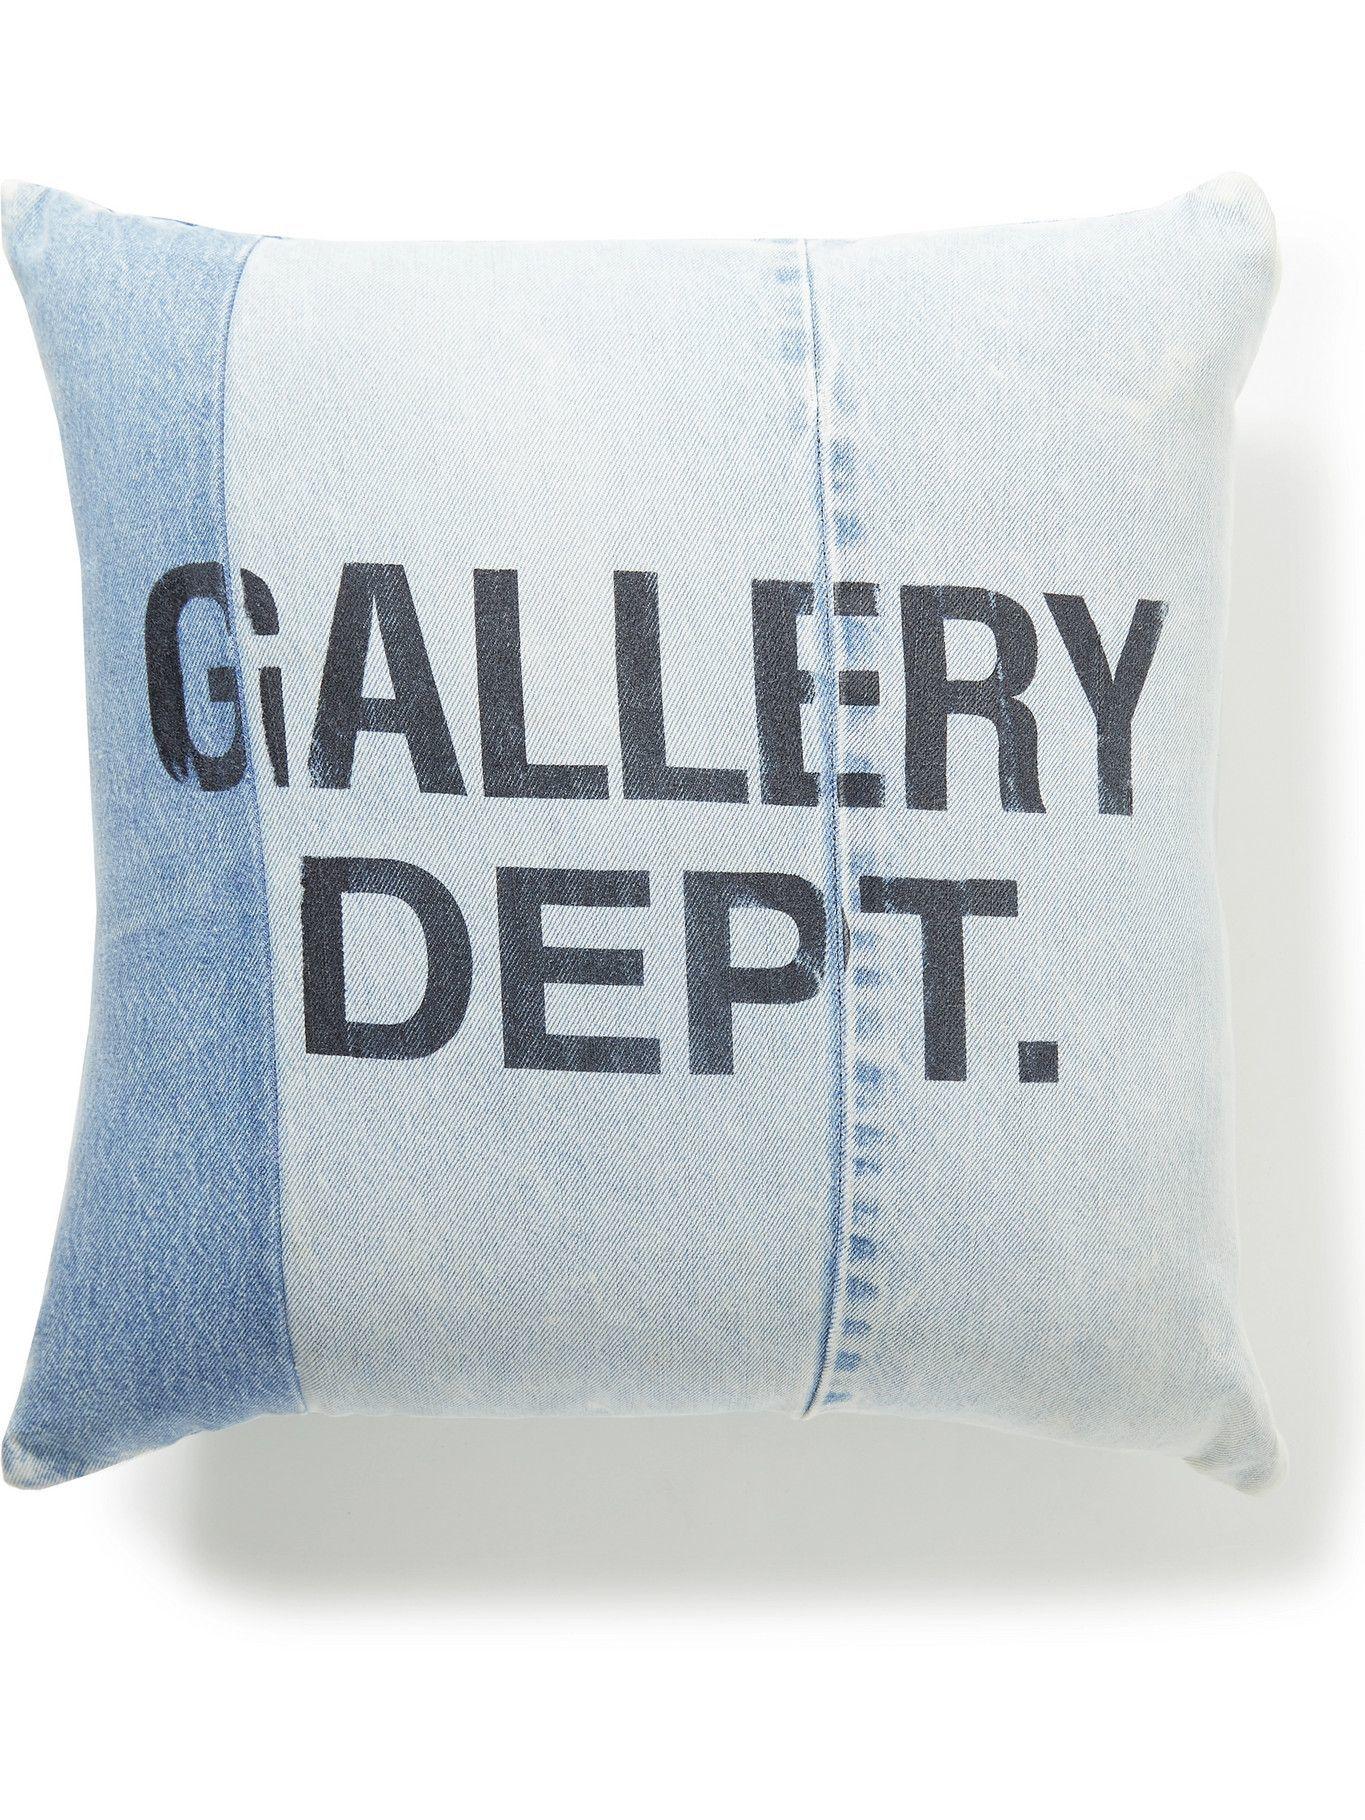 Photo: Gallery Dept. - Logo-Print Denim Pillow